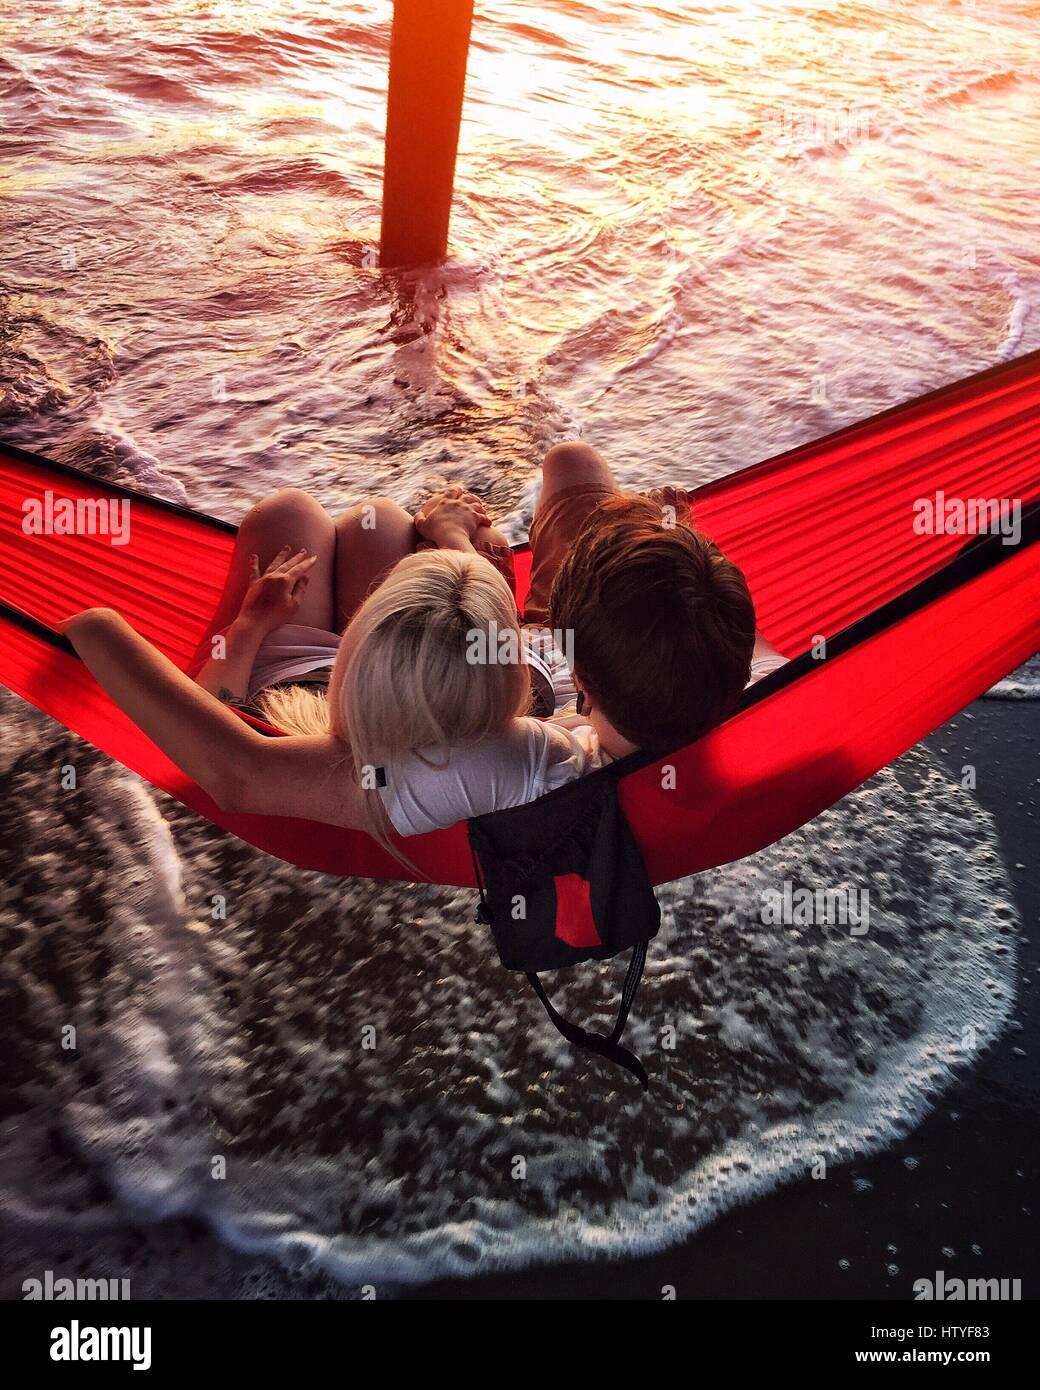 Couple sitting in a hammock under the pier, Aptos, California, America, USA - Stock Image